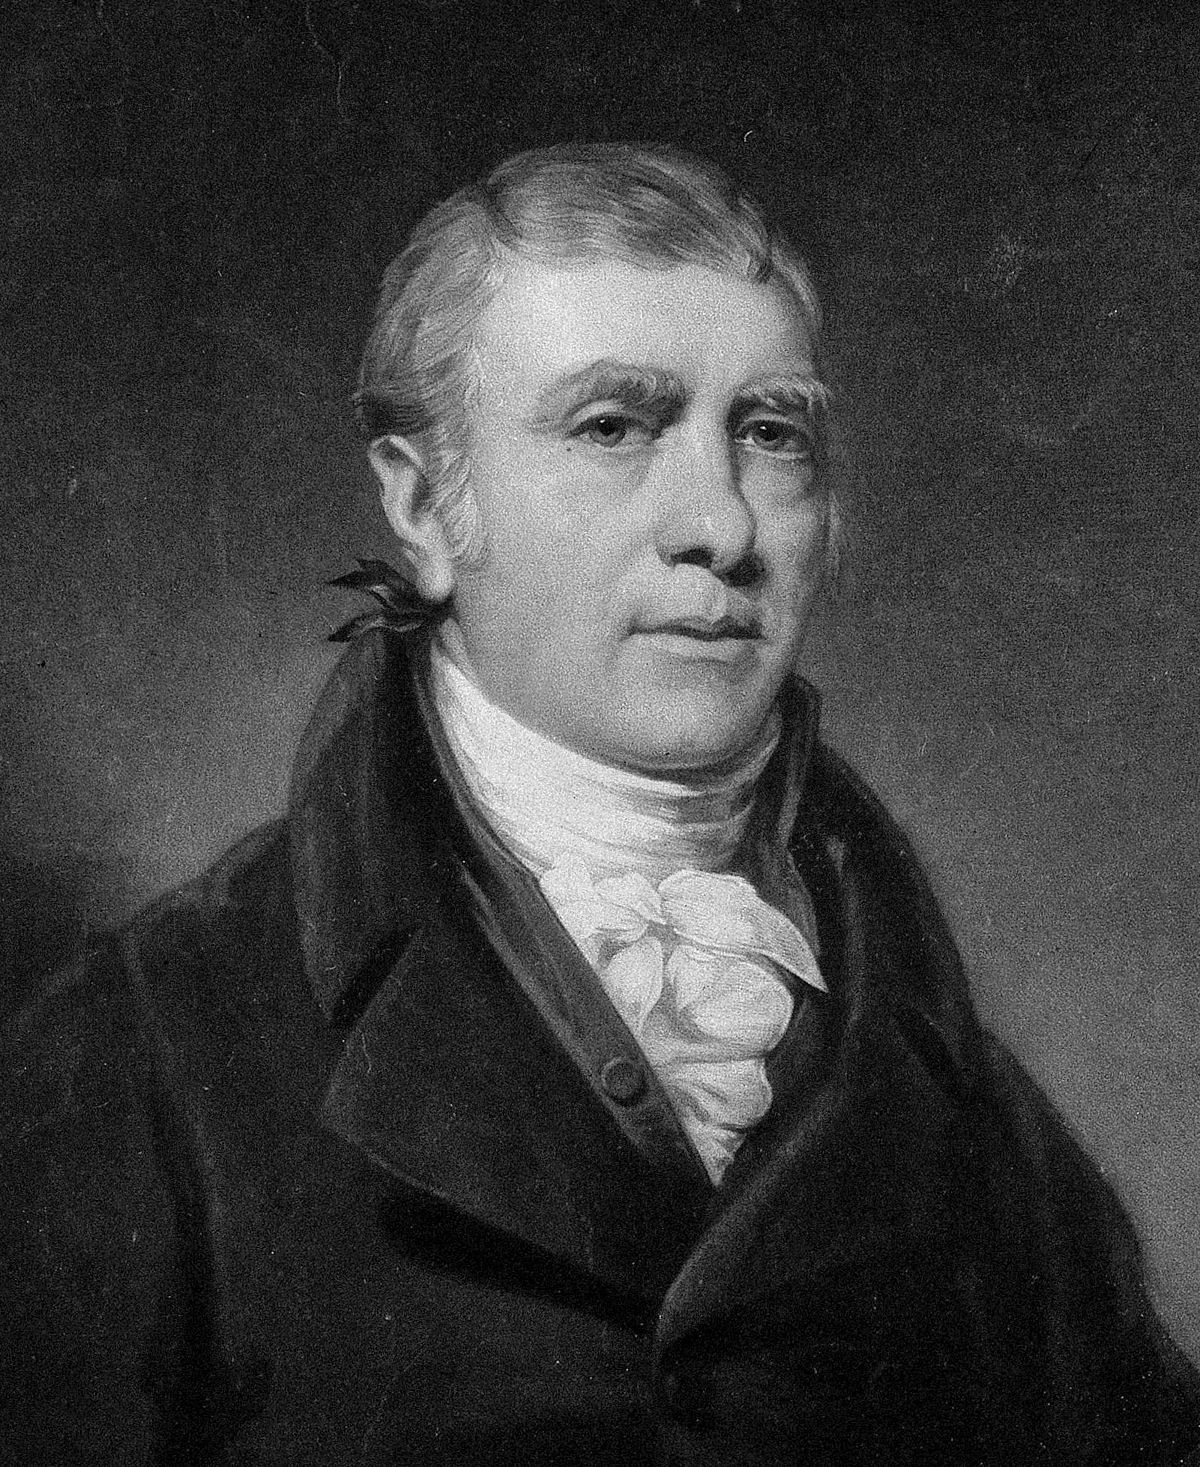 John barclay anatomist wikipedia for The barclay